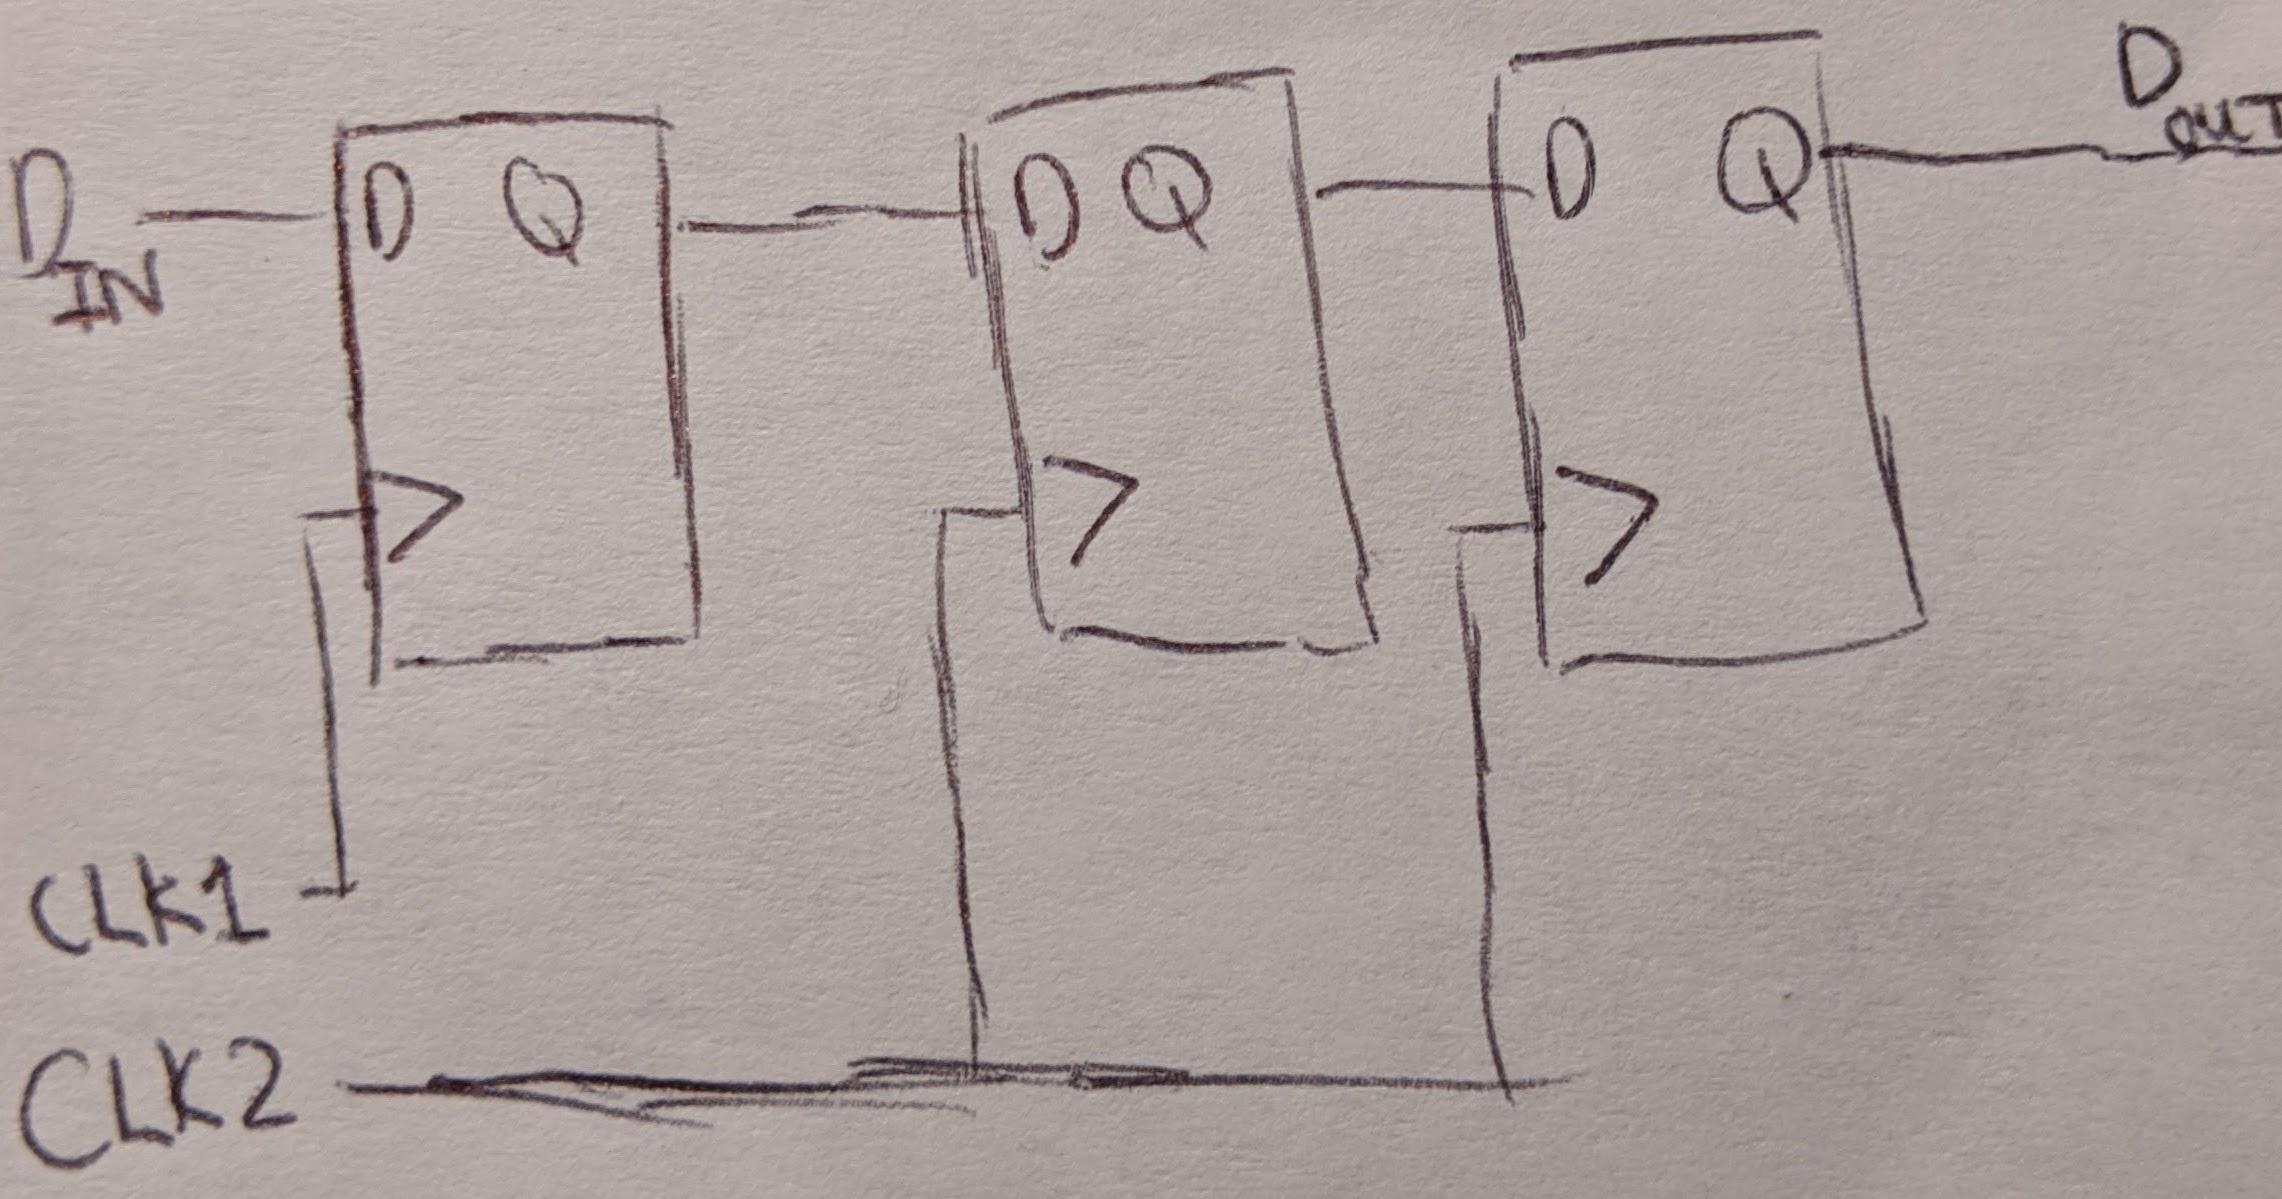 Sync chain figure